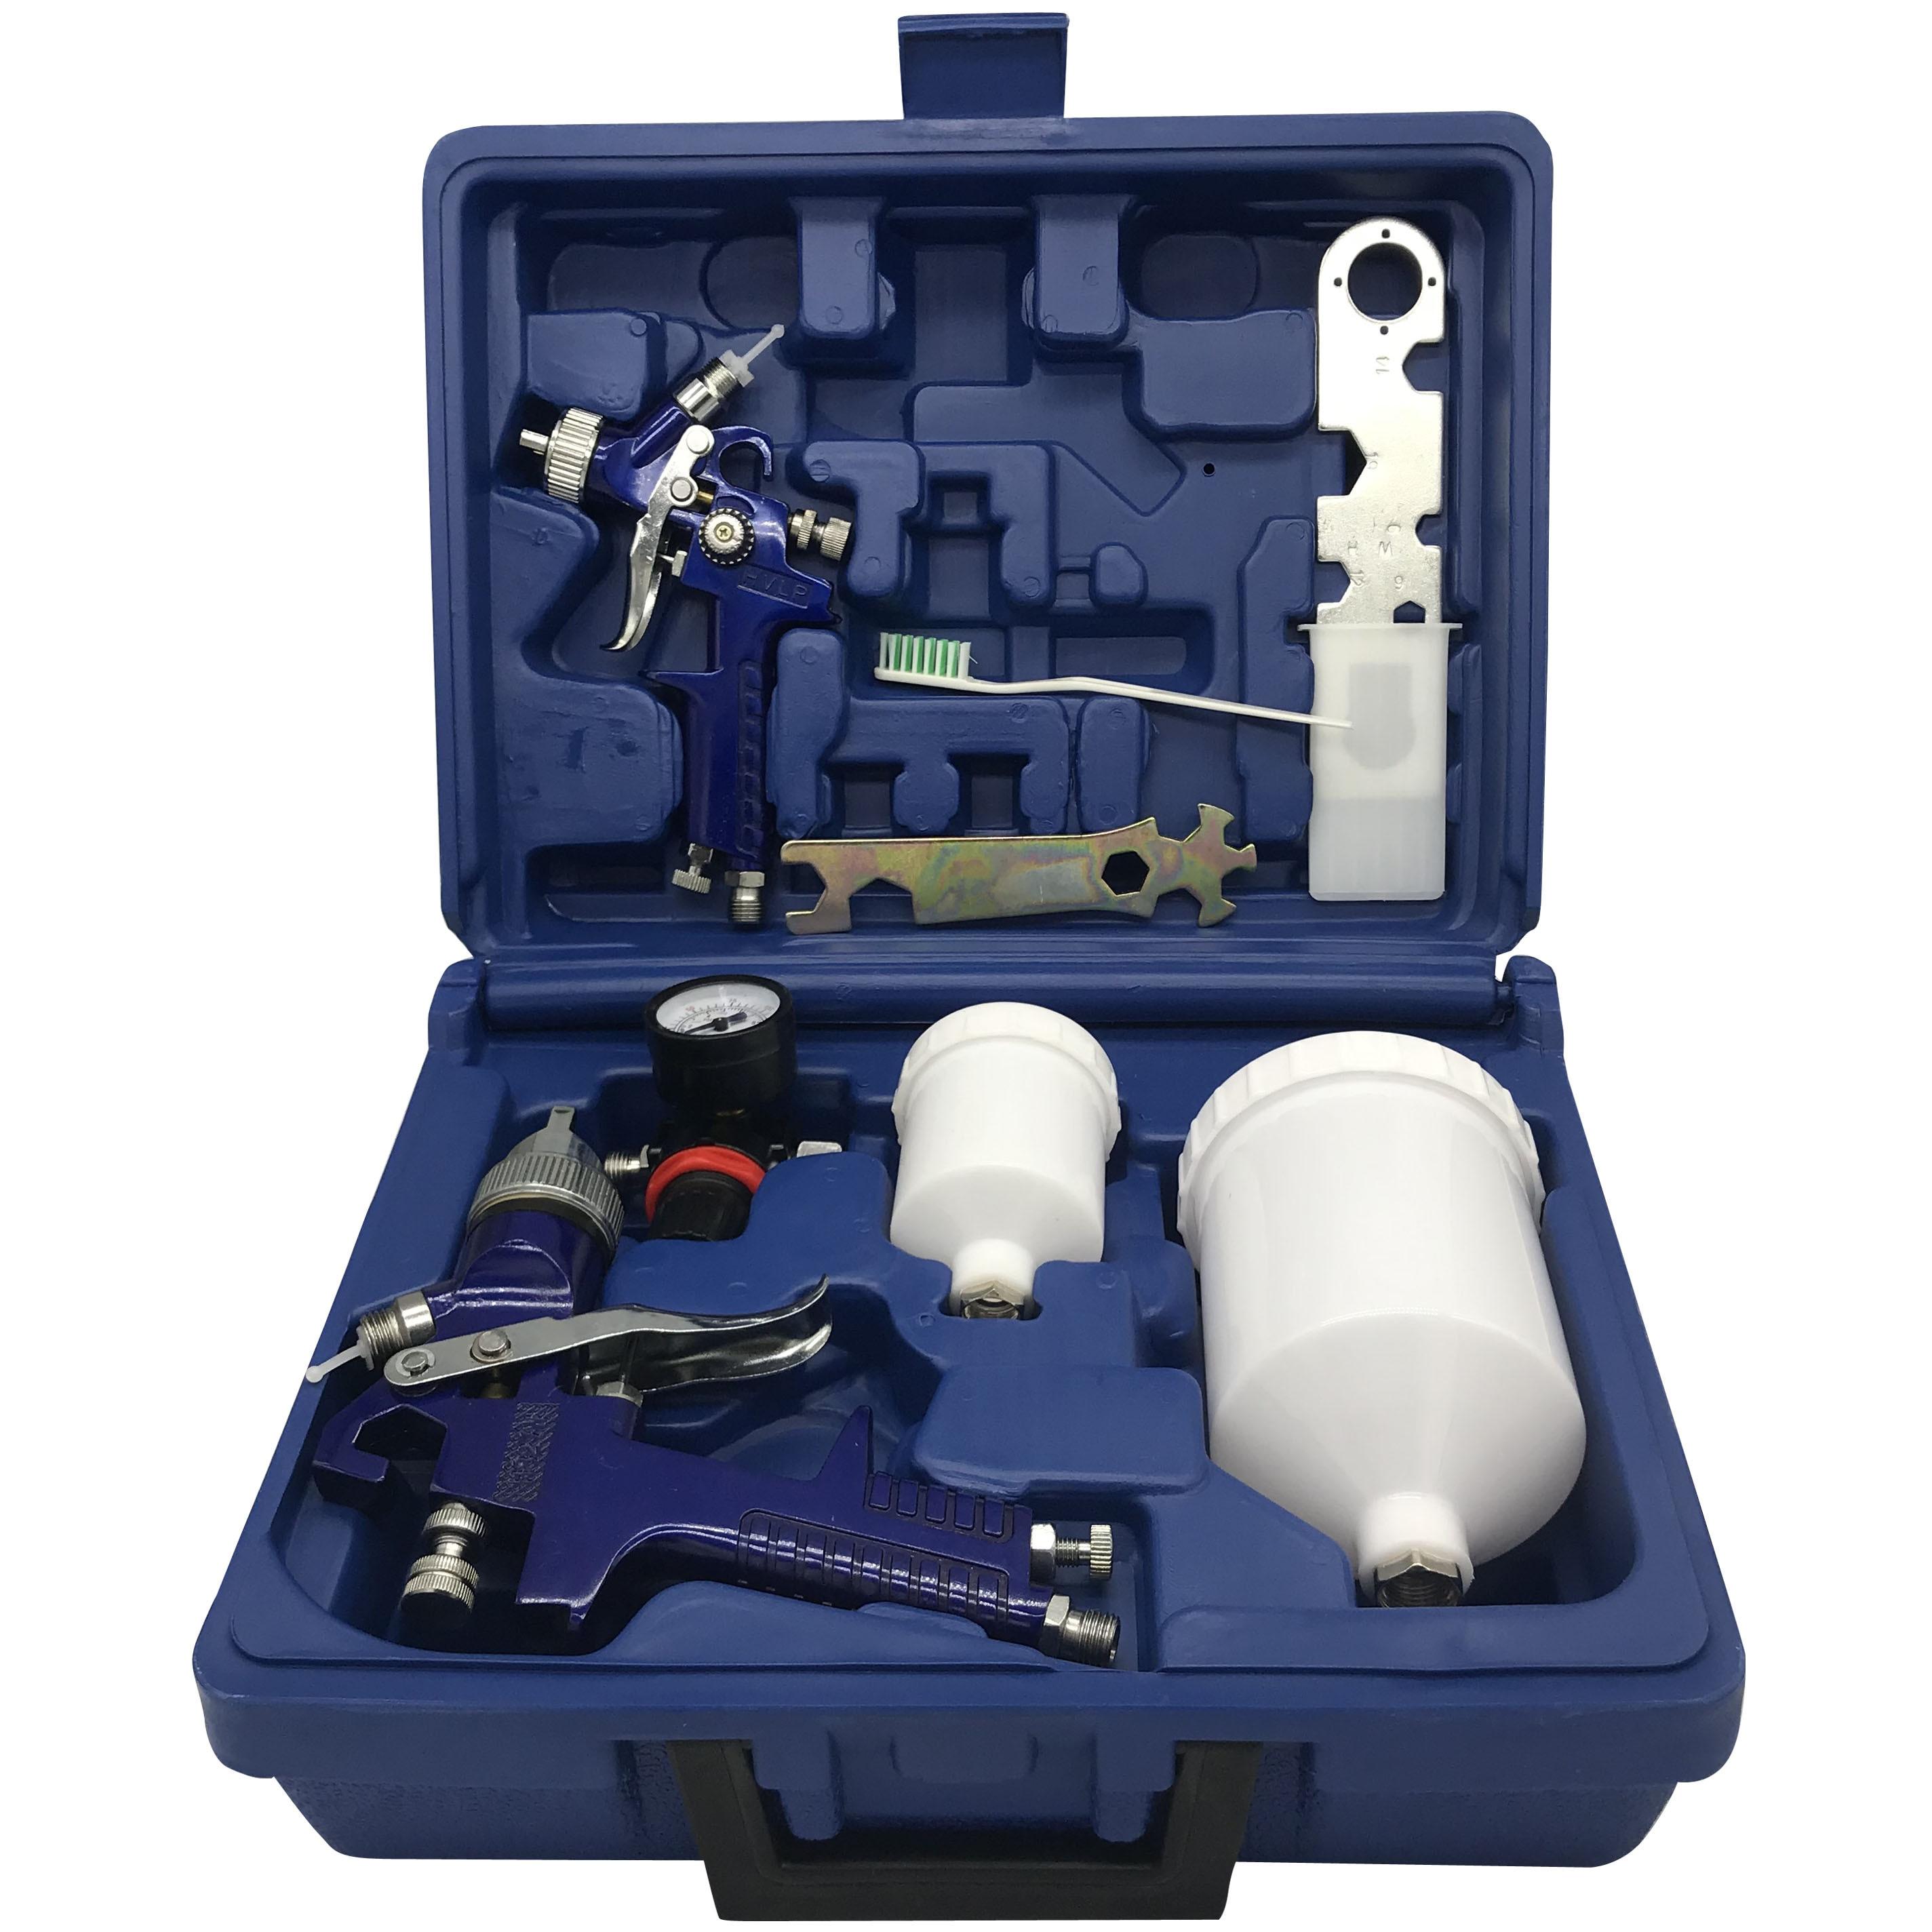 H827   H2000 spray paint gun with box Airbrush airless spray gun for painting cars Pneumatic tool 1 0 1 4mm